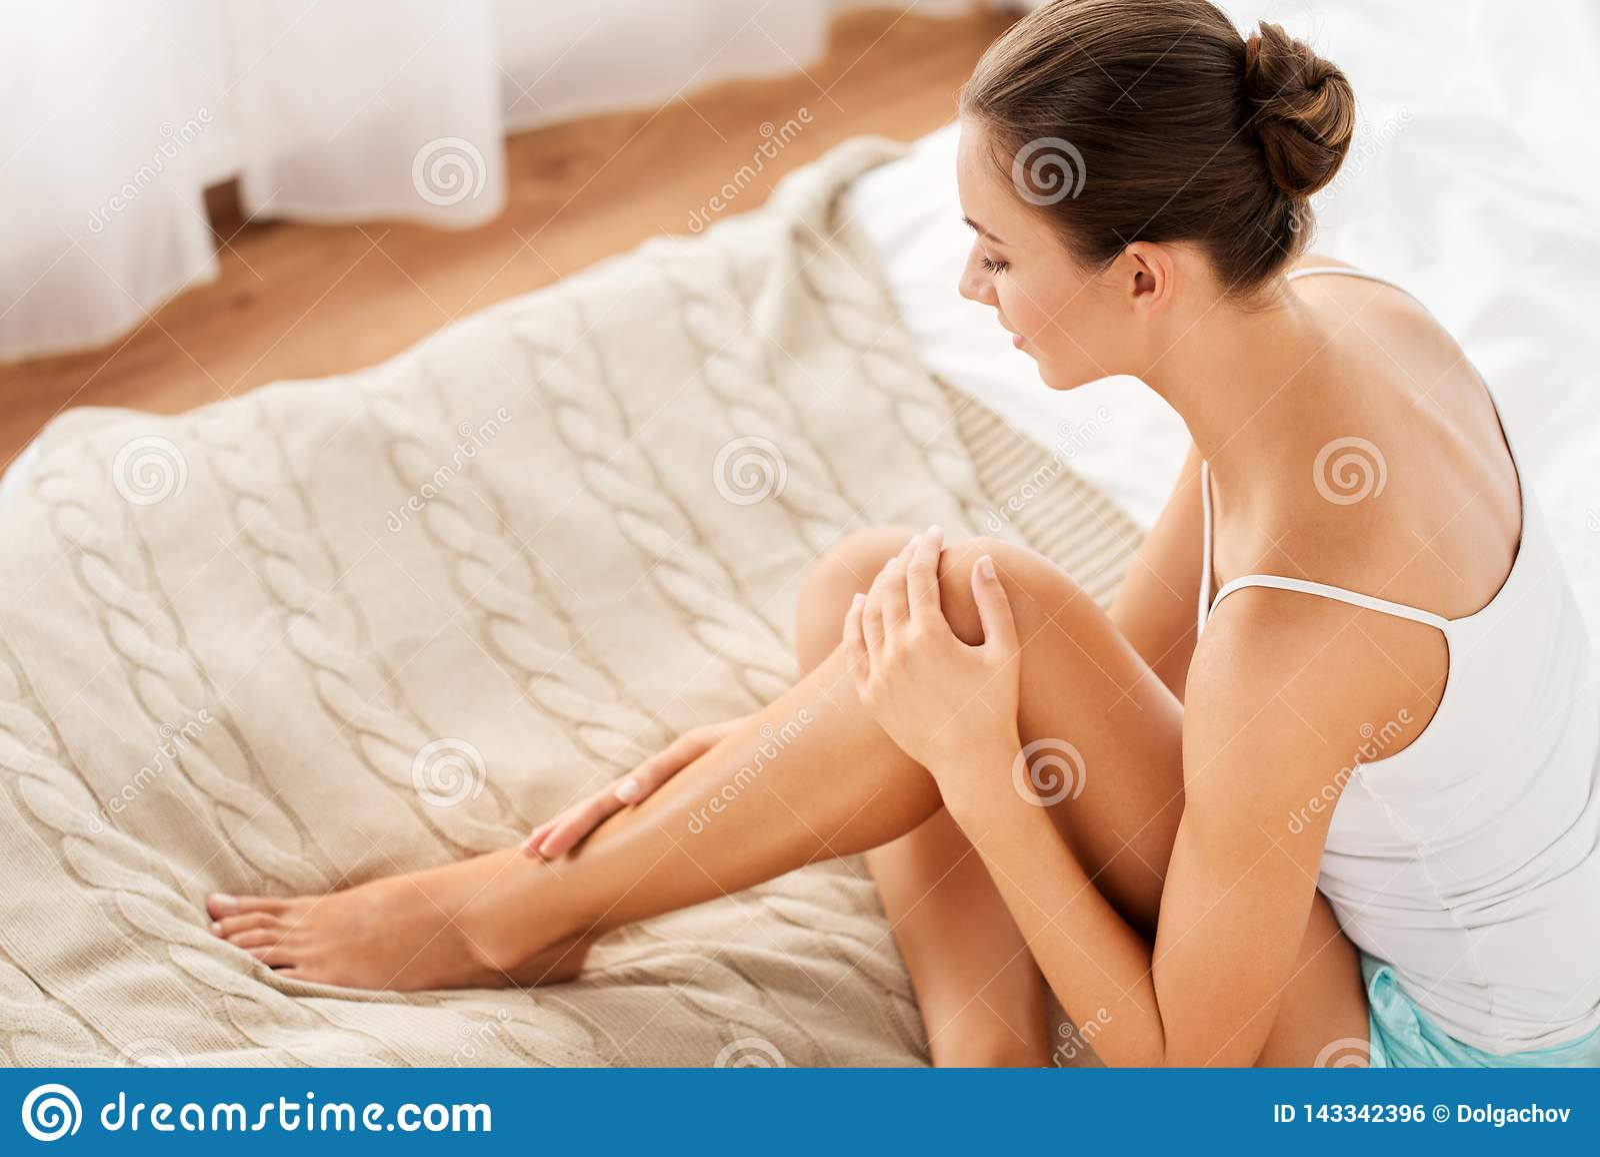 Piękna kobieta z nagimi nogami na łóżku w domu